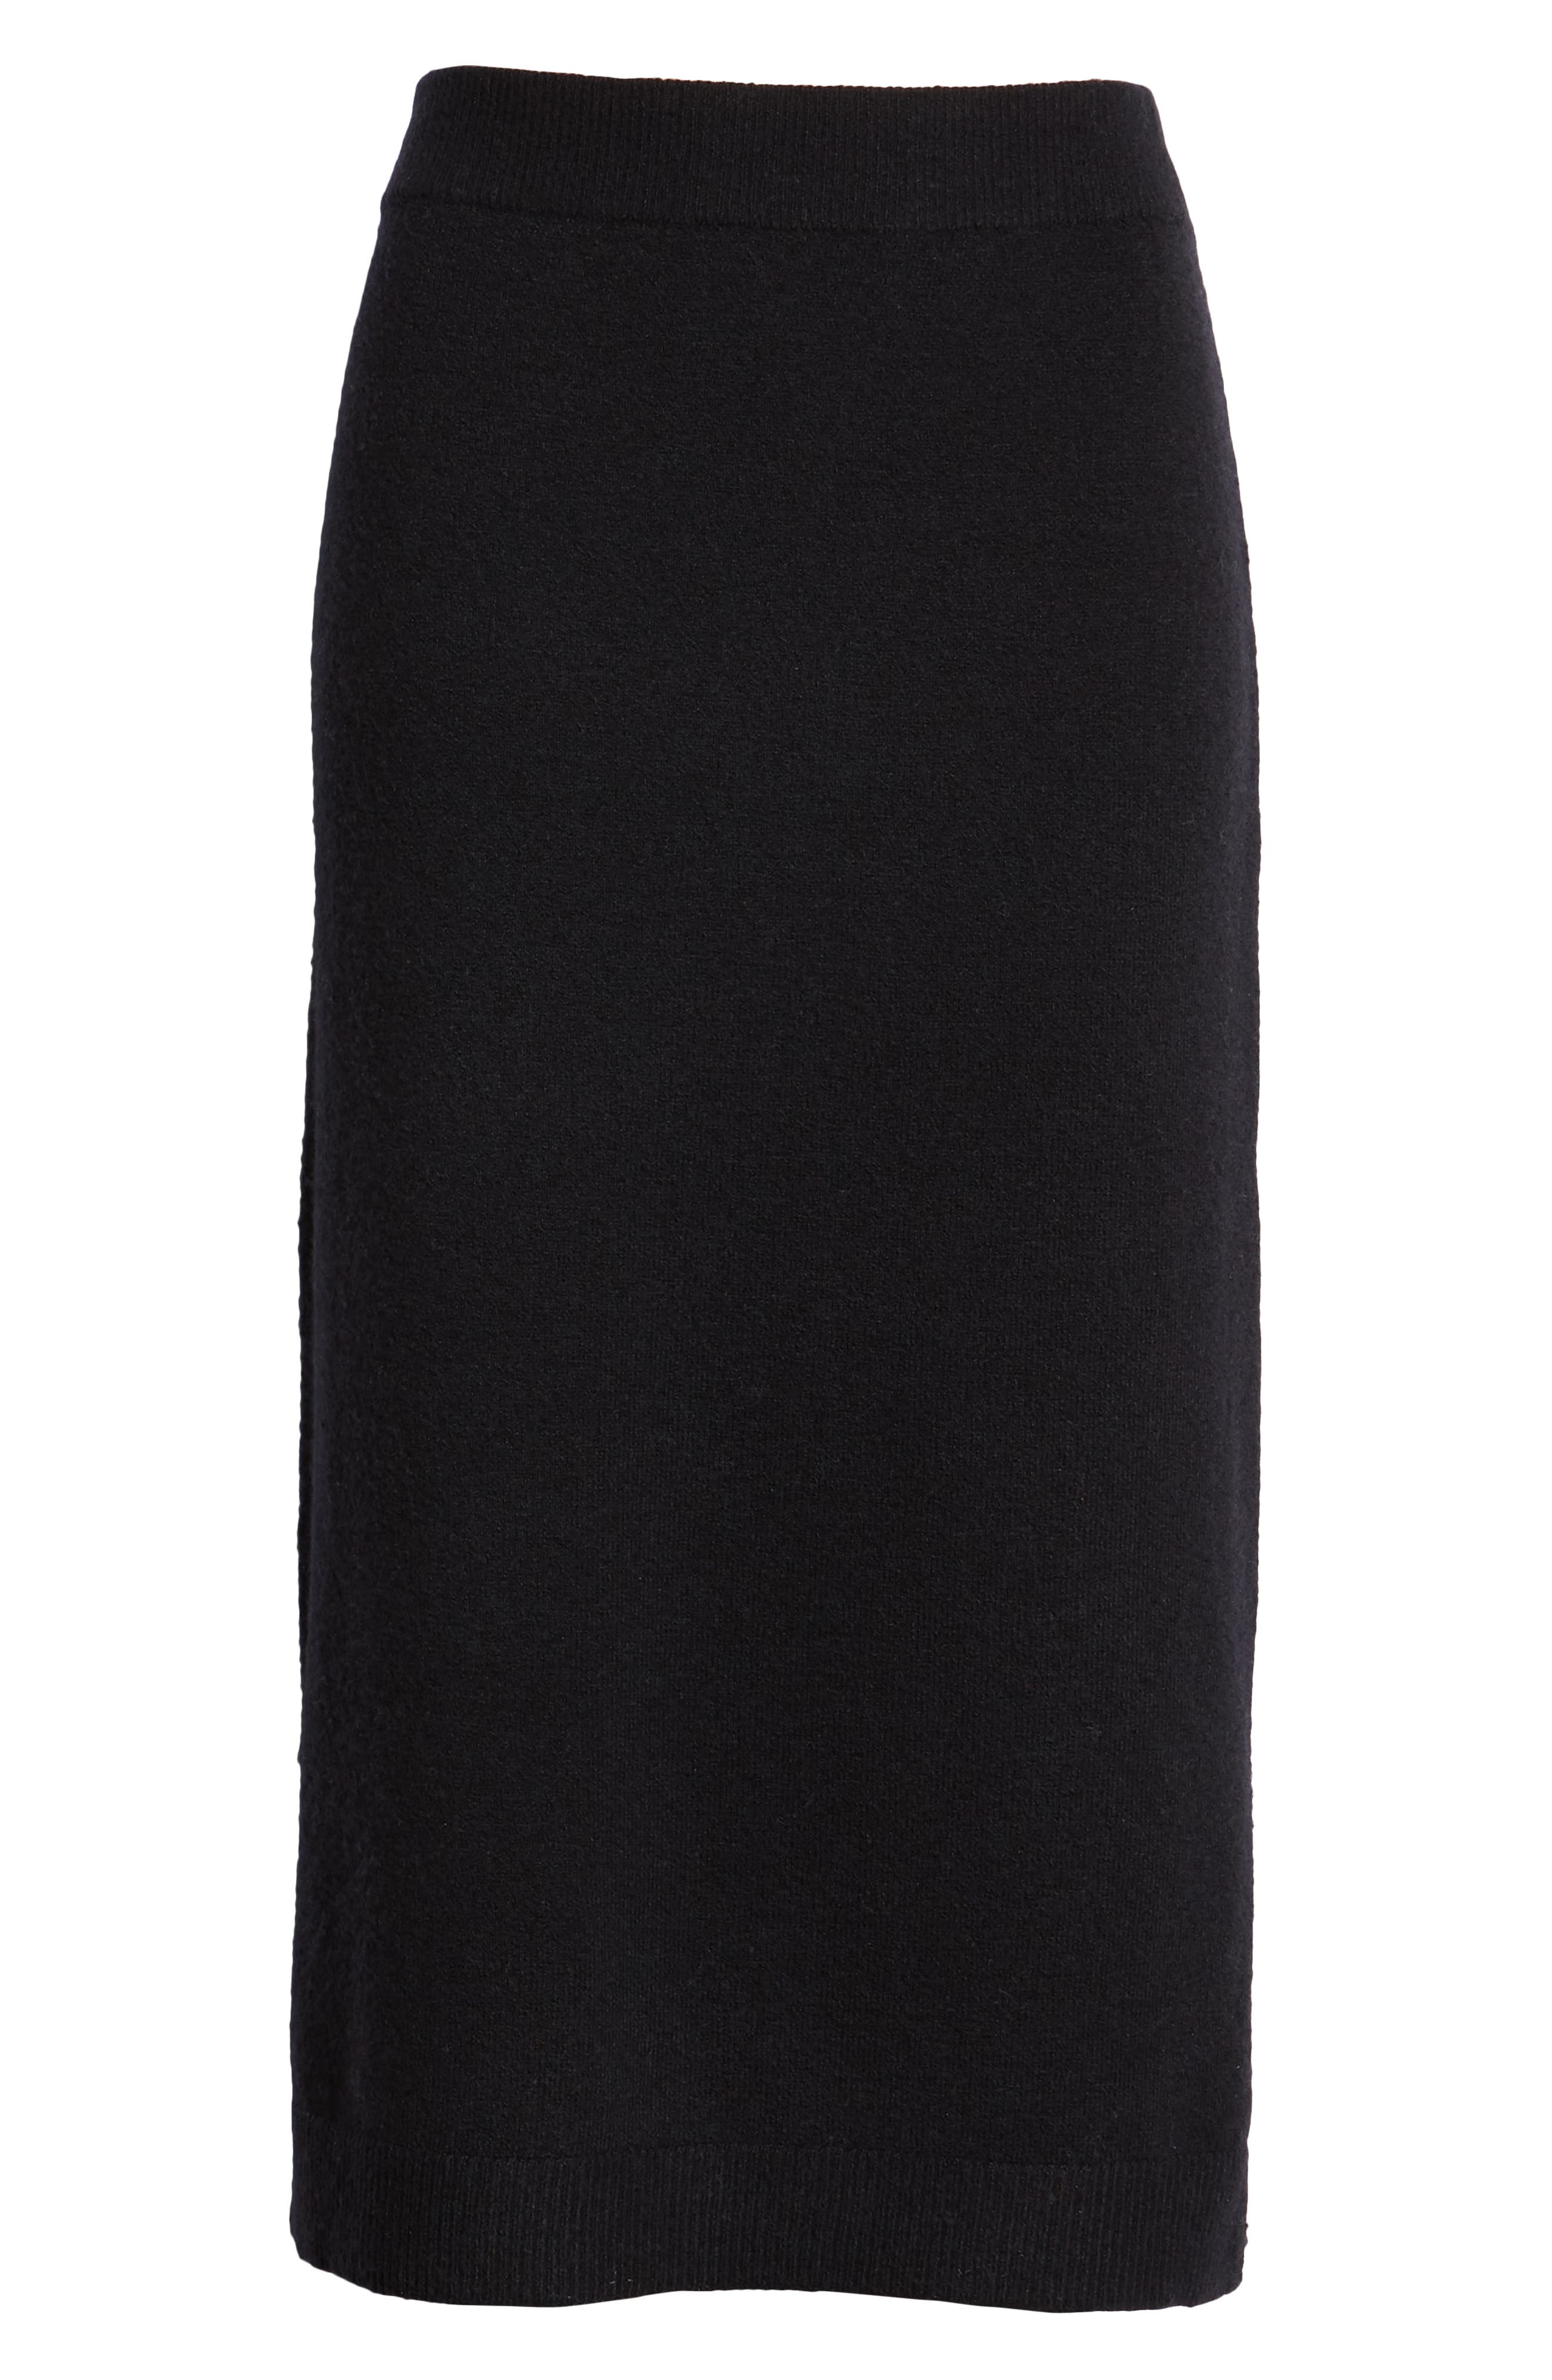 Sweater Pencil Sweater Skirt,                             Alternate thumbnail 6, color,                             BLACK